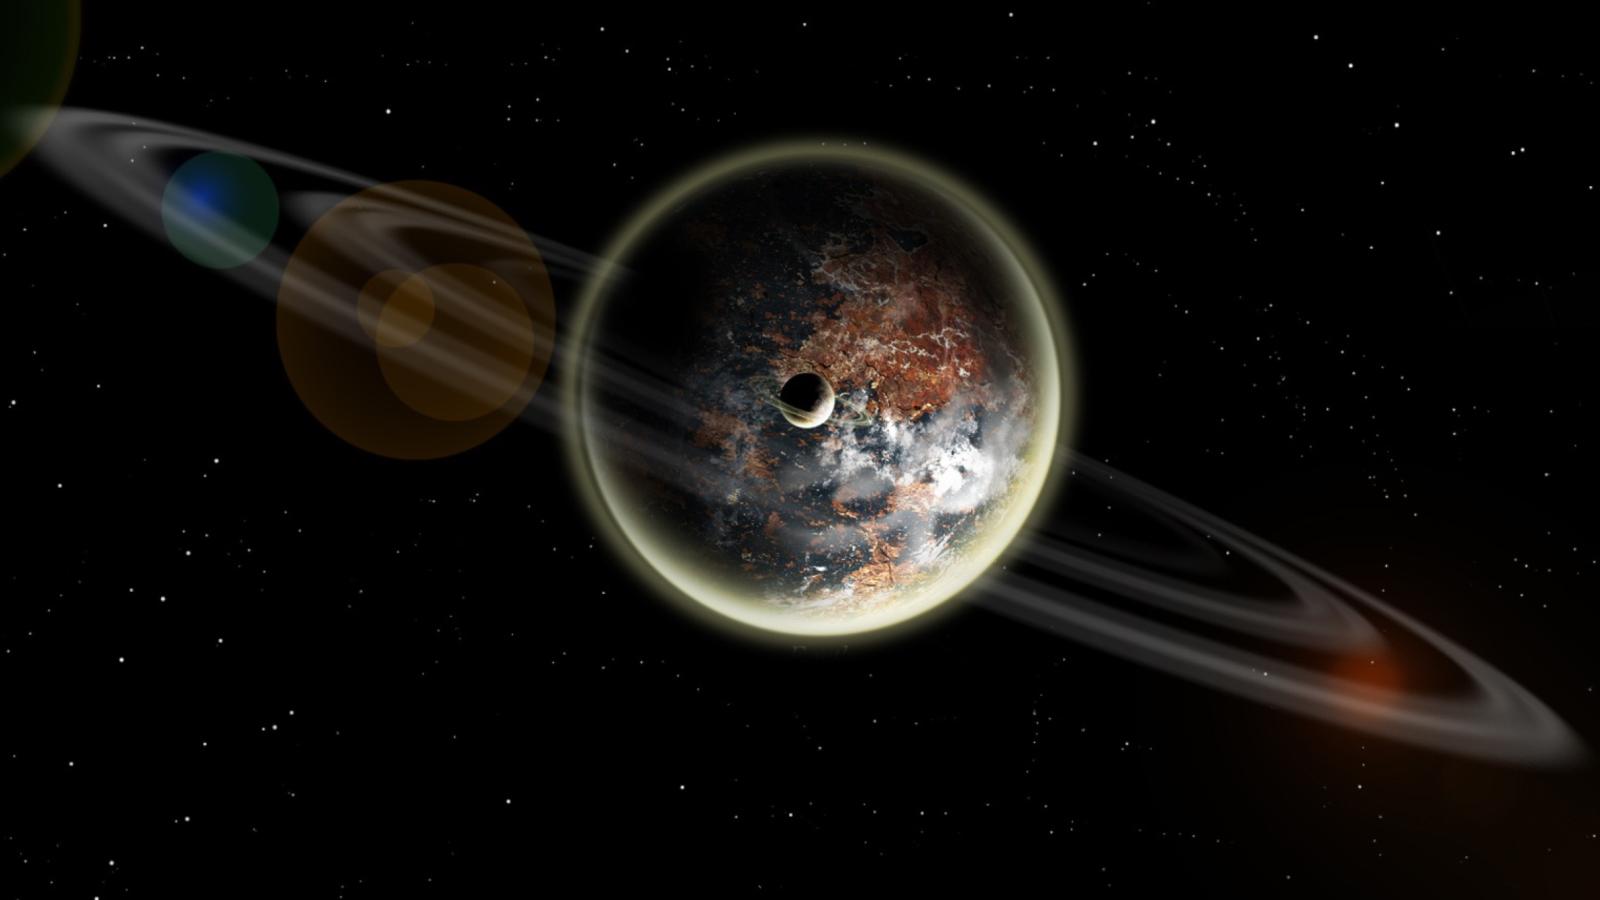 Distant Planet Like Earth on Planet Kepler 186f